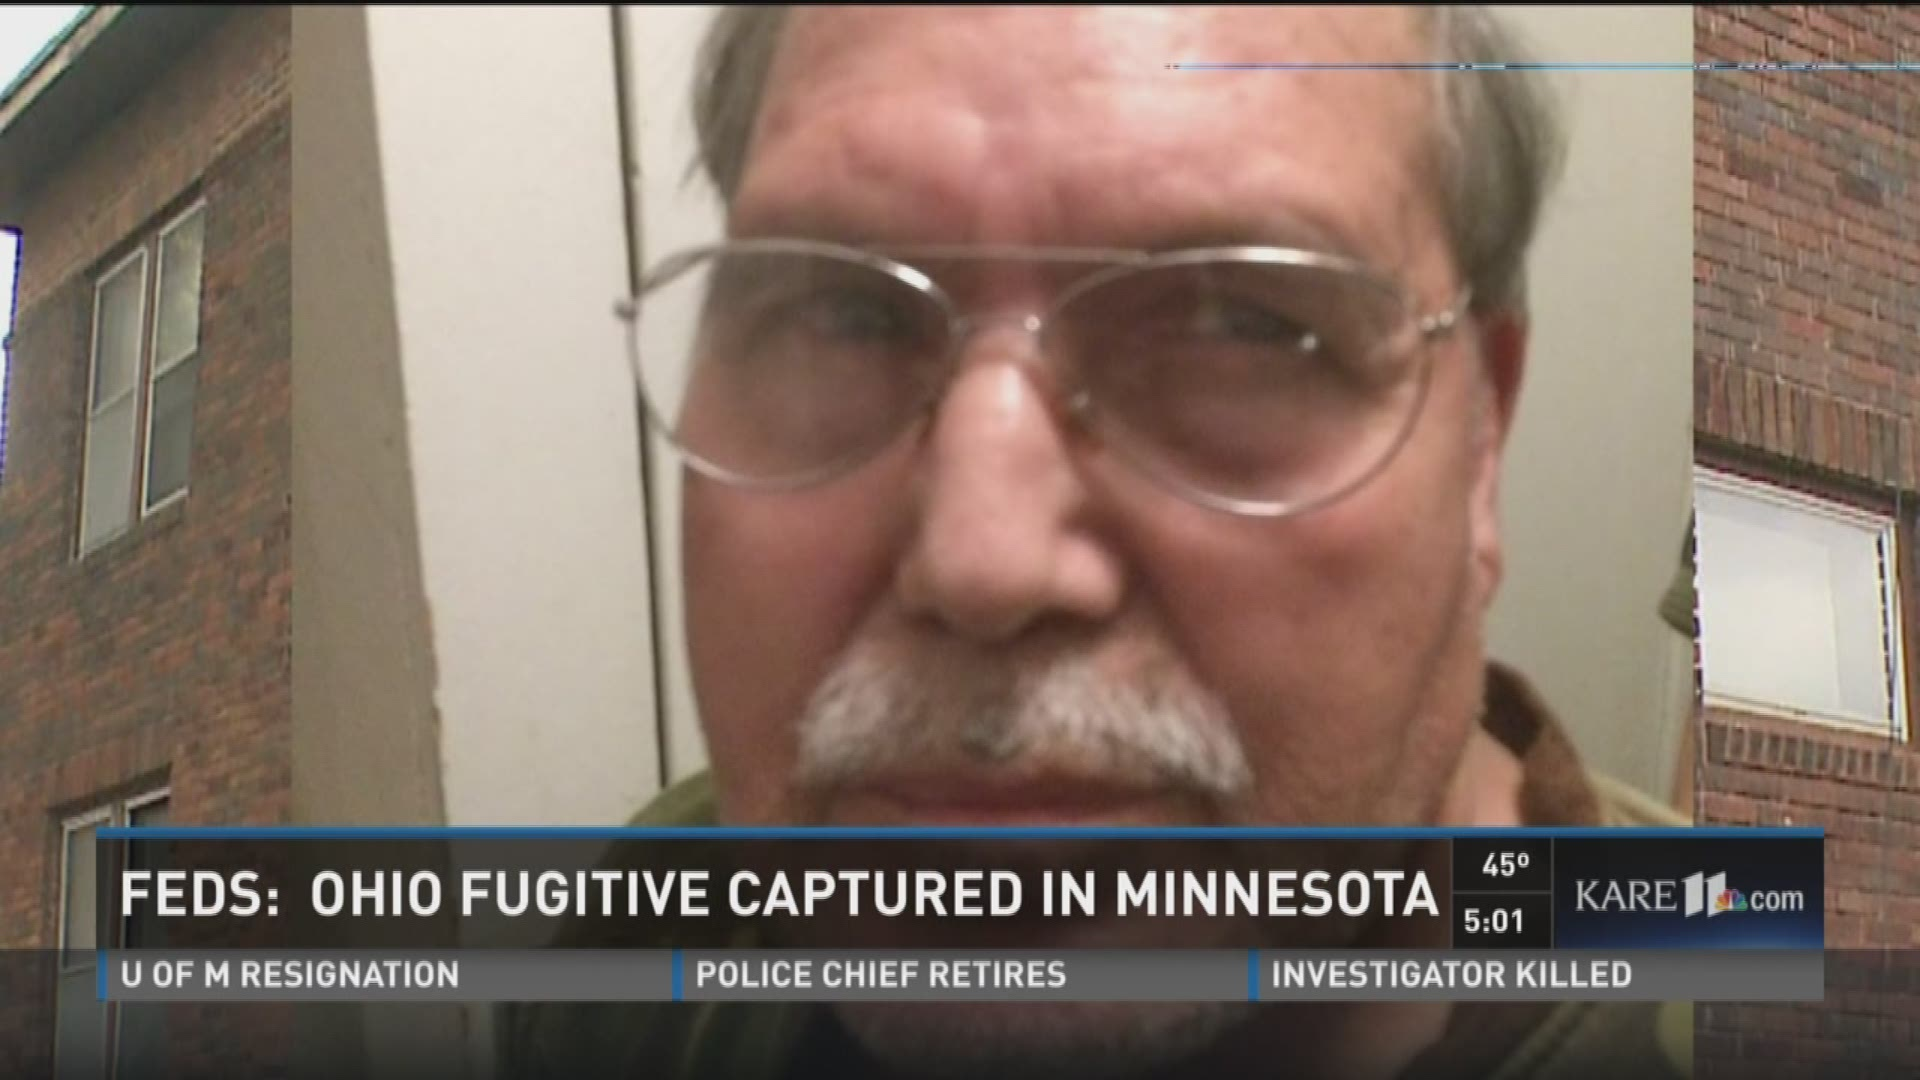 Ohio fugitive captured in Minnesota